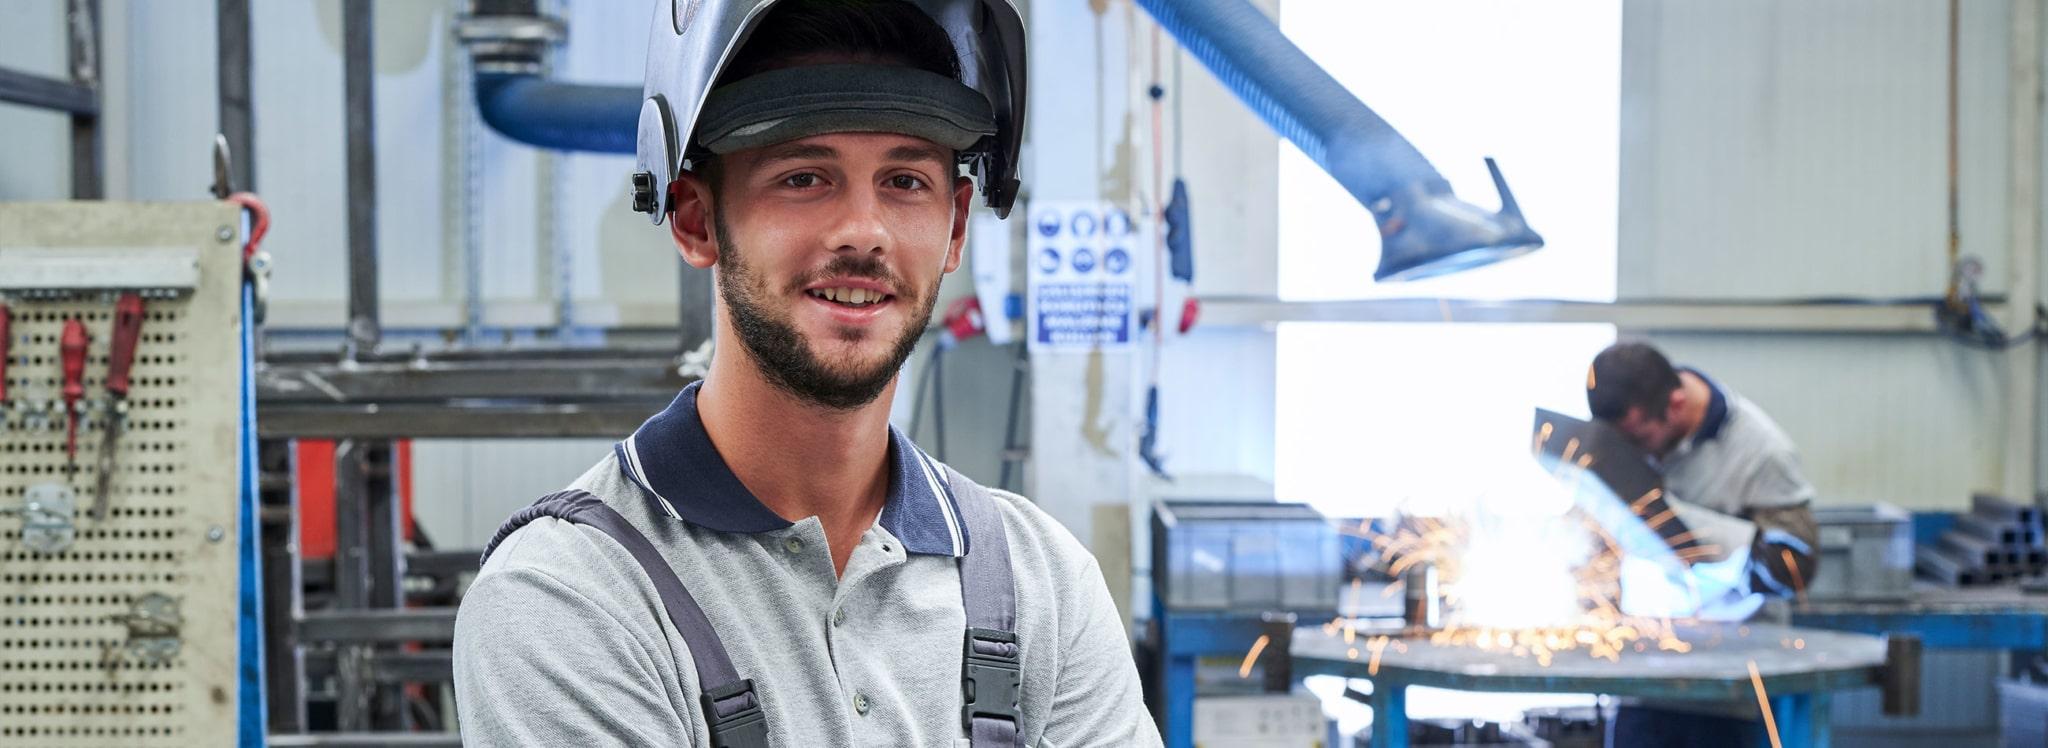 Wollny Personal GmbH - Tarifvertrag